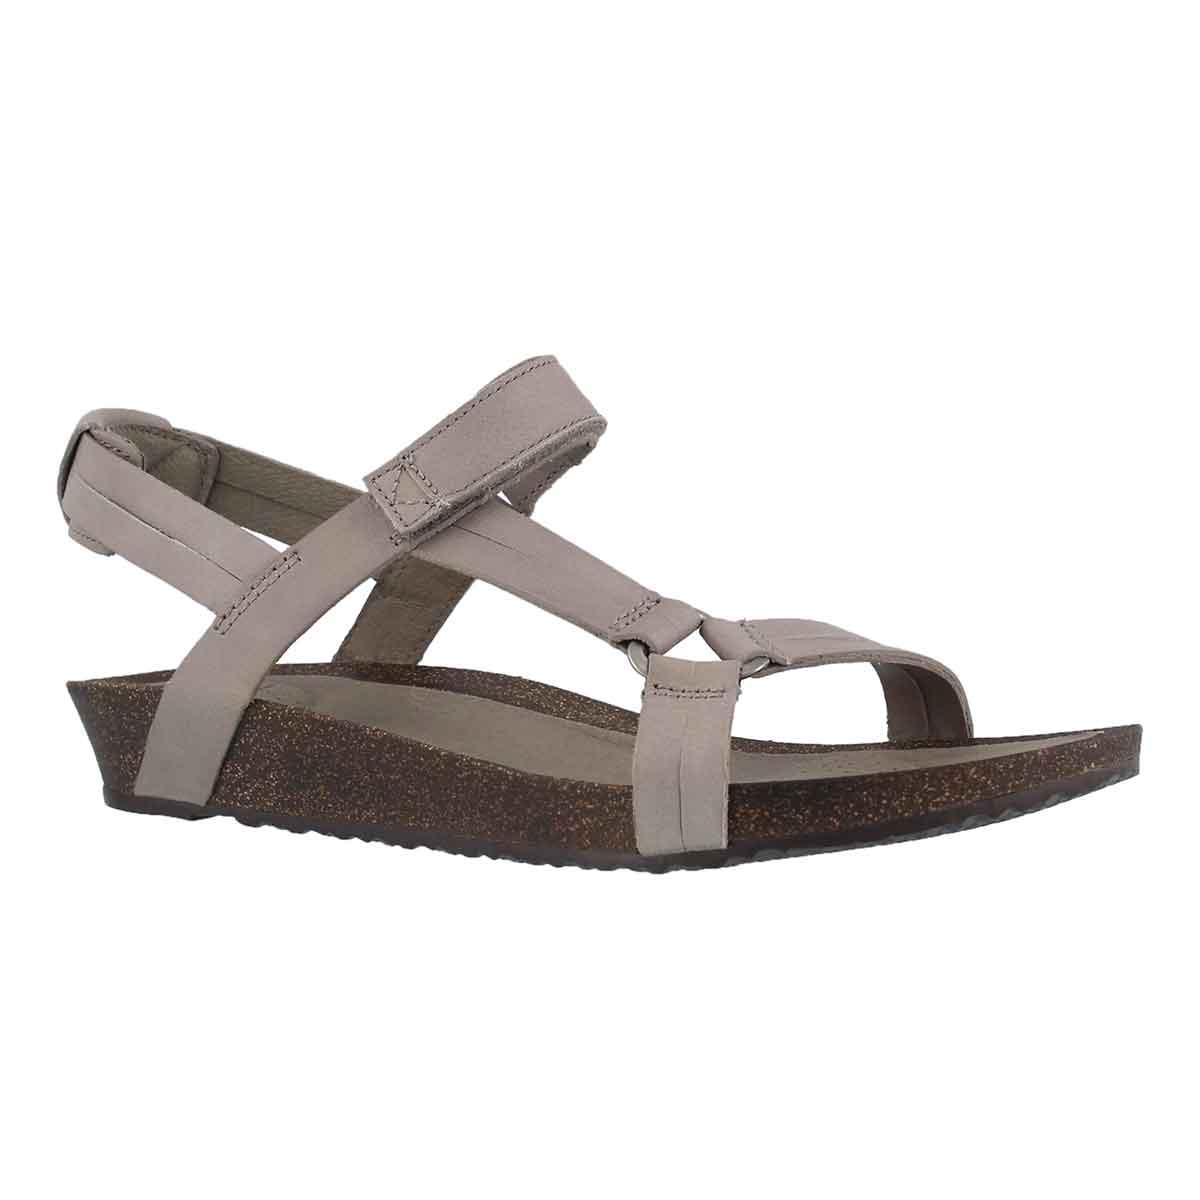 Women's YSIDRO UNIVERSAL taupe casual sandal